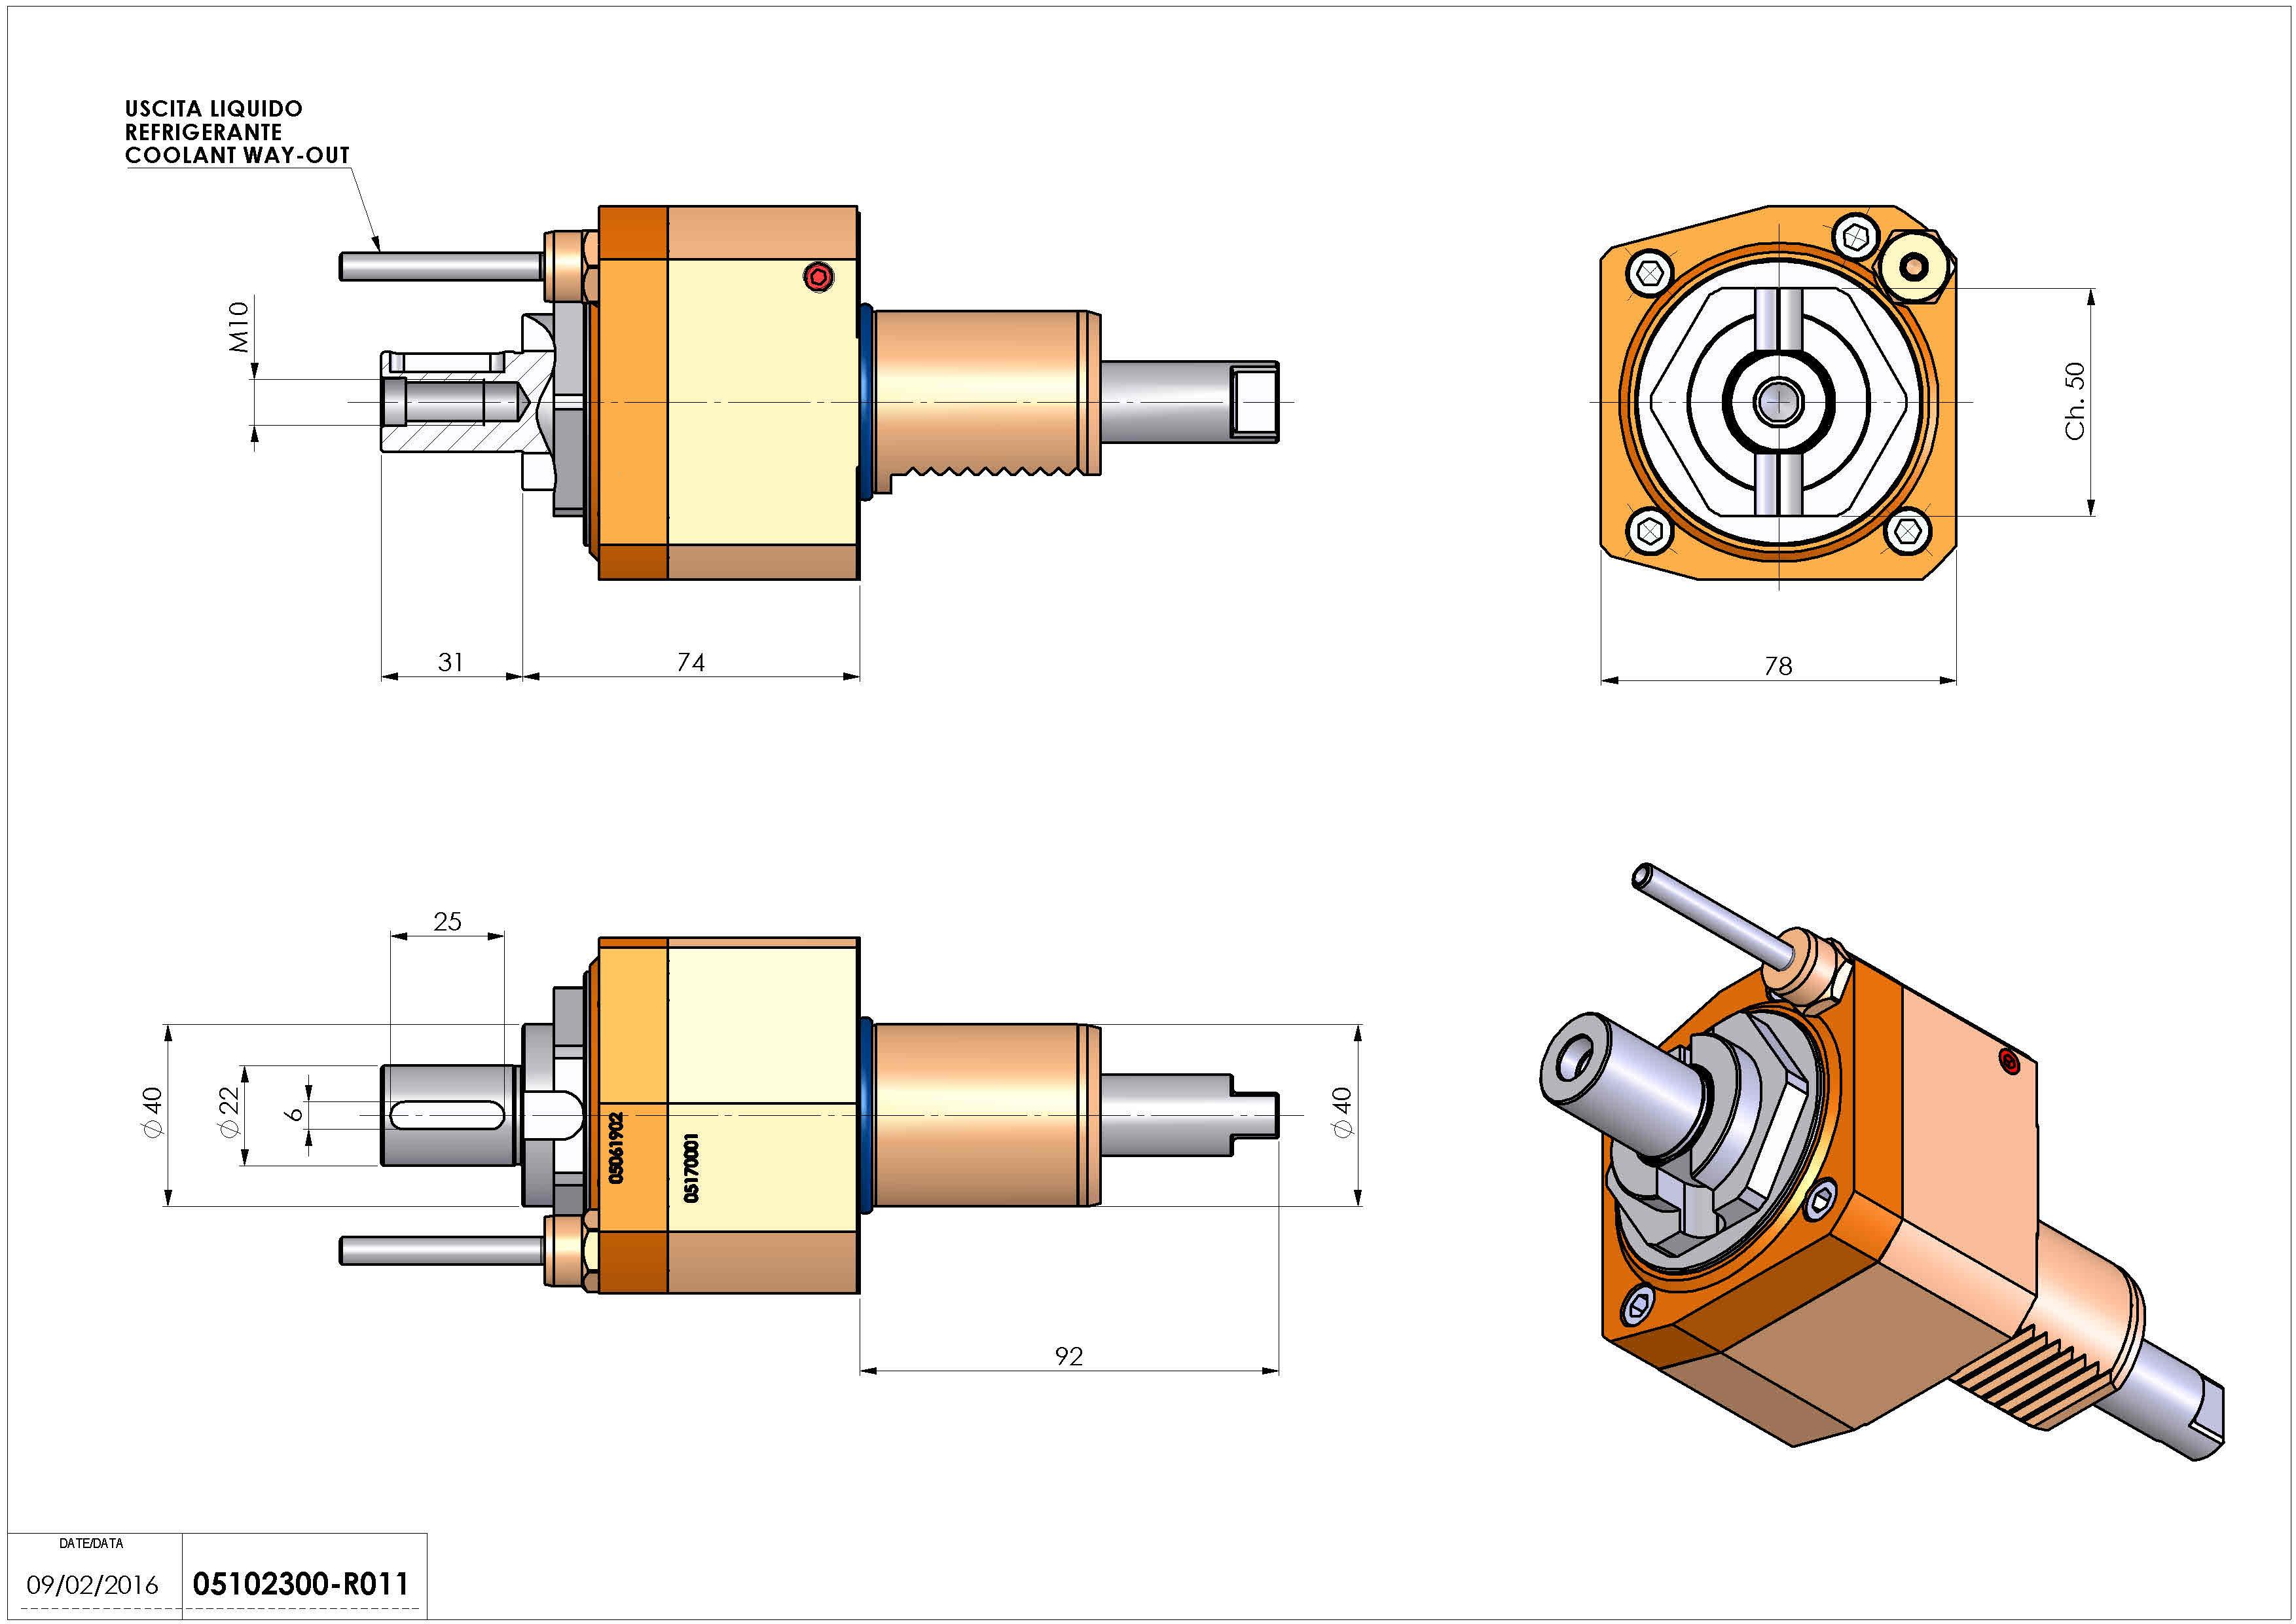 Technical image - LT-S VDI40 DIN138-22 H74 HW.